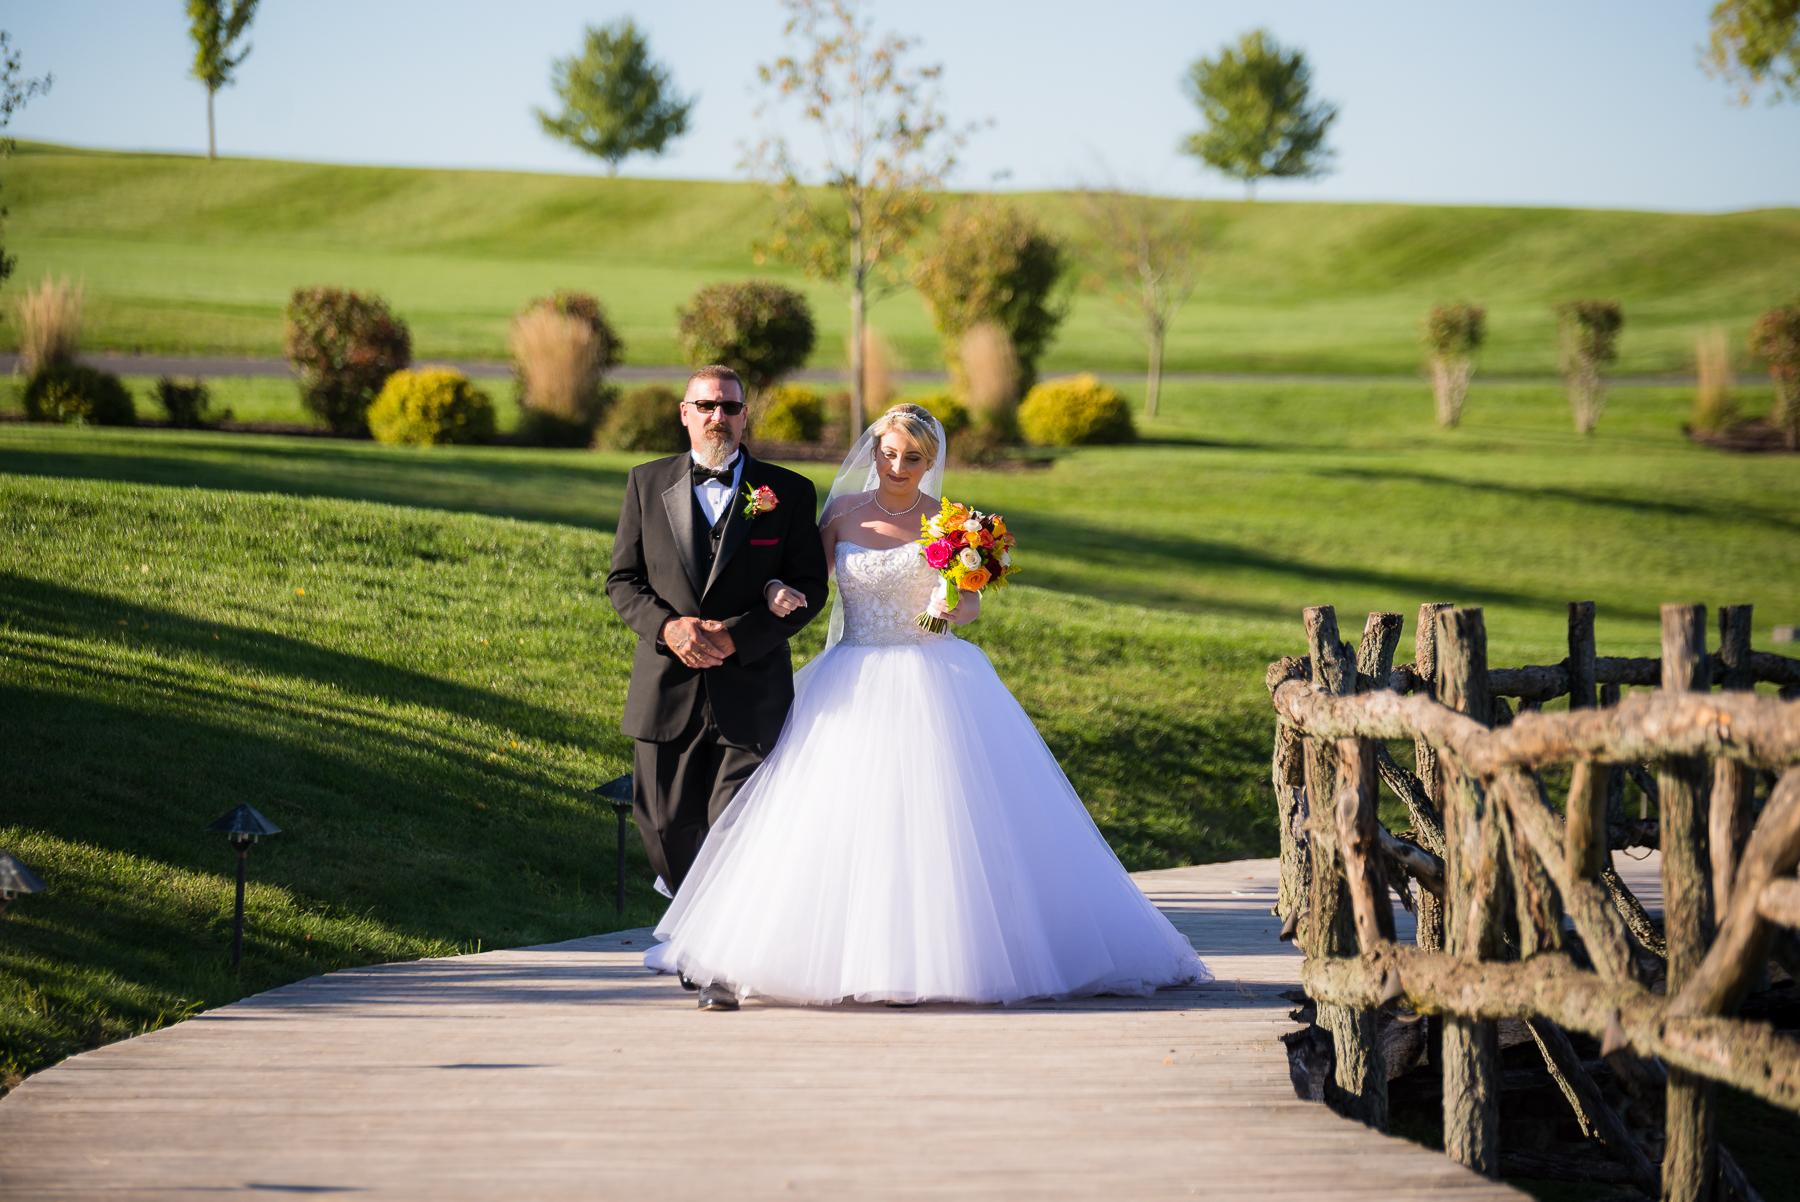 Kim-Ray-Wedding-Garcia-Photography-9913.jpg